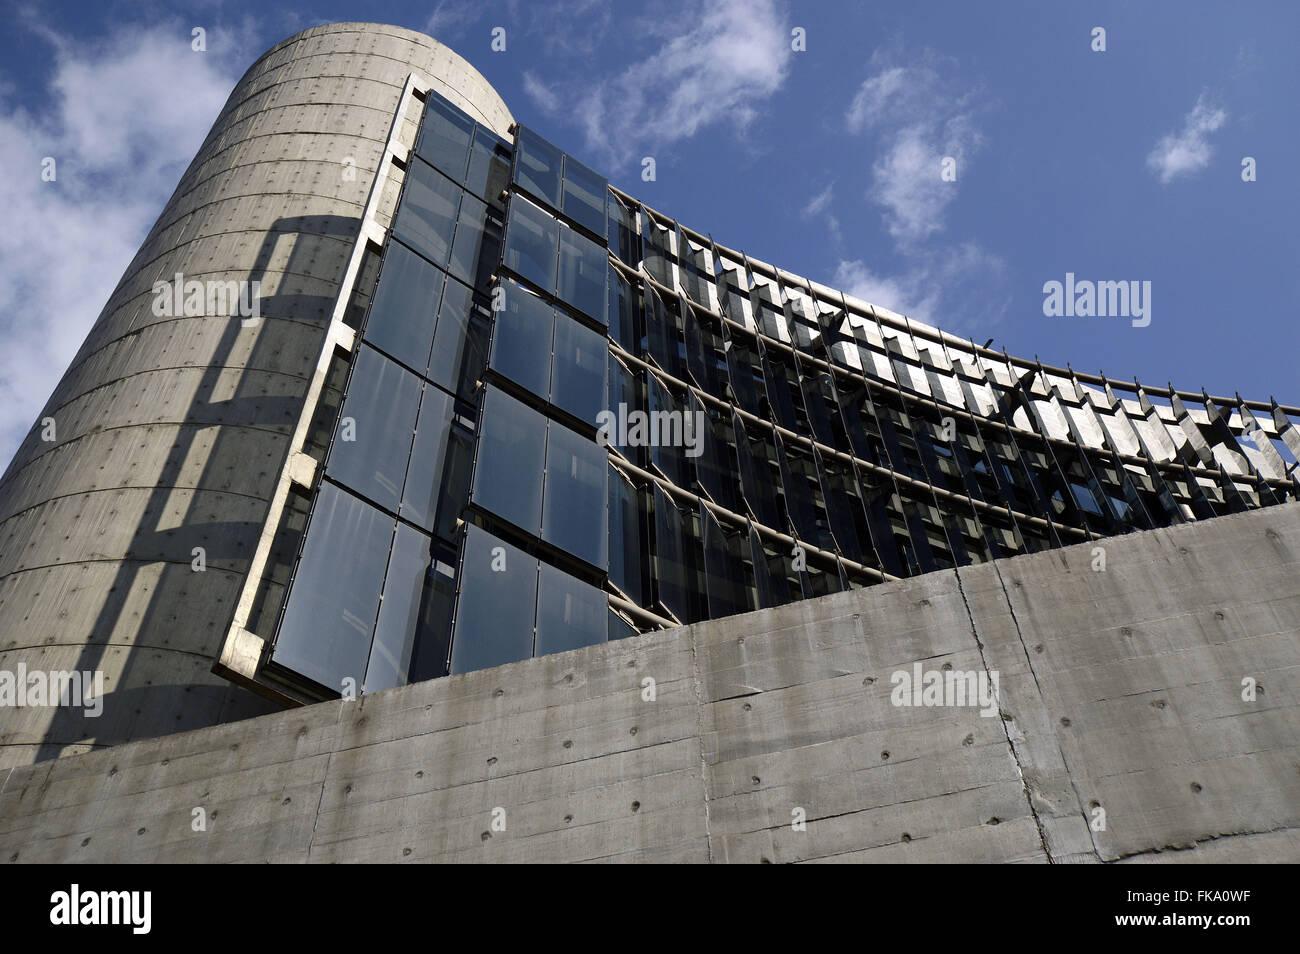 Detalhe do Centro da Cultura Judaica ou la Casa de Cultura de Israele Immagini Stock